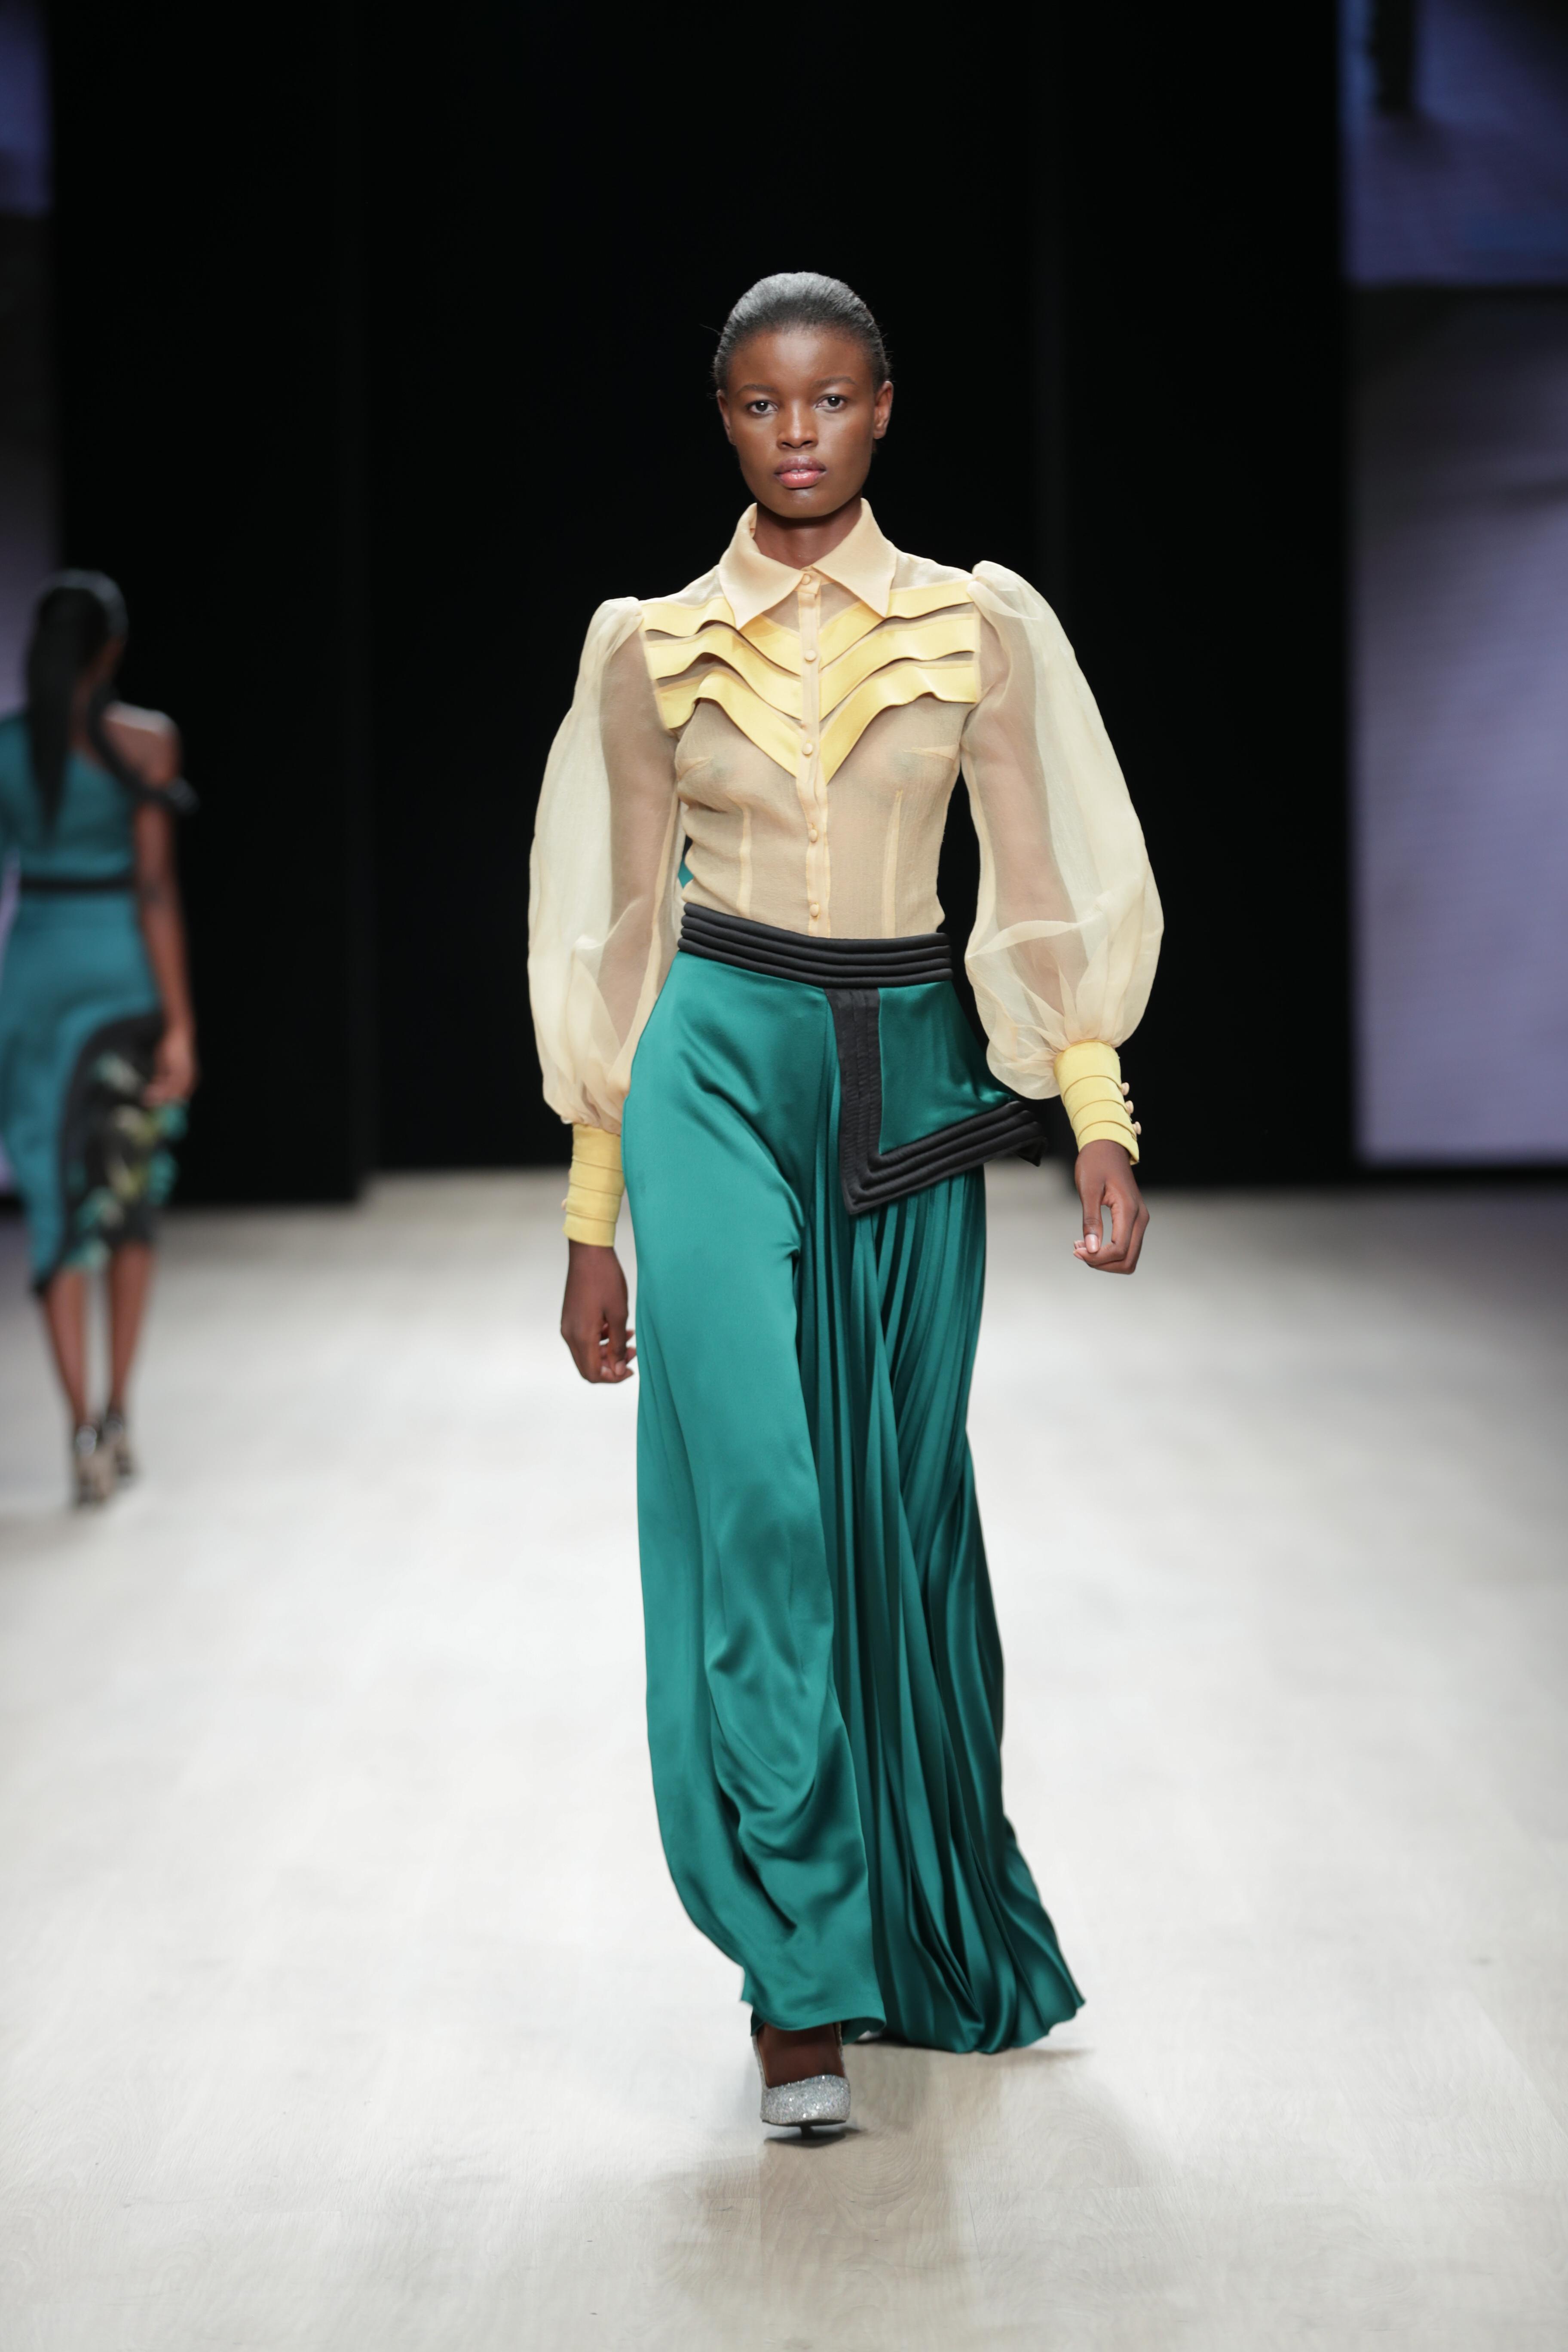 ARISE Fashion Week 2019 – Runway Day 2: Yutee Rone